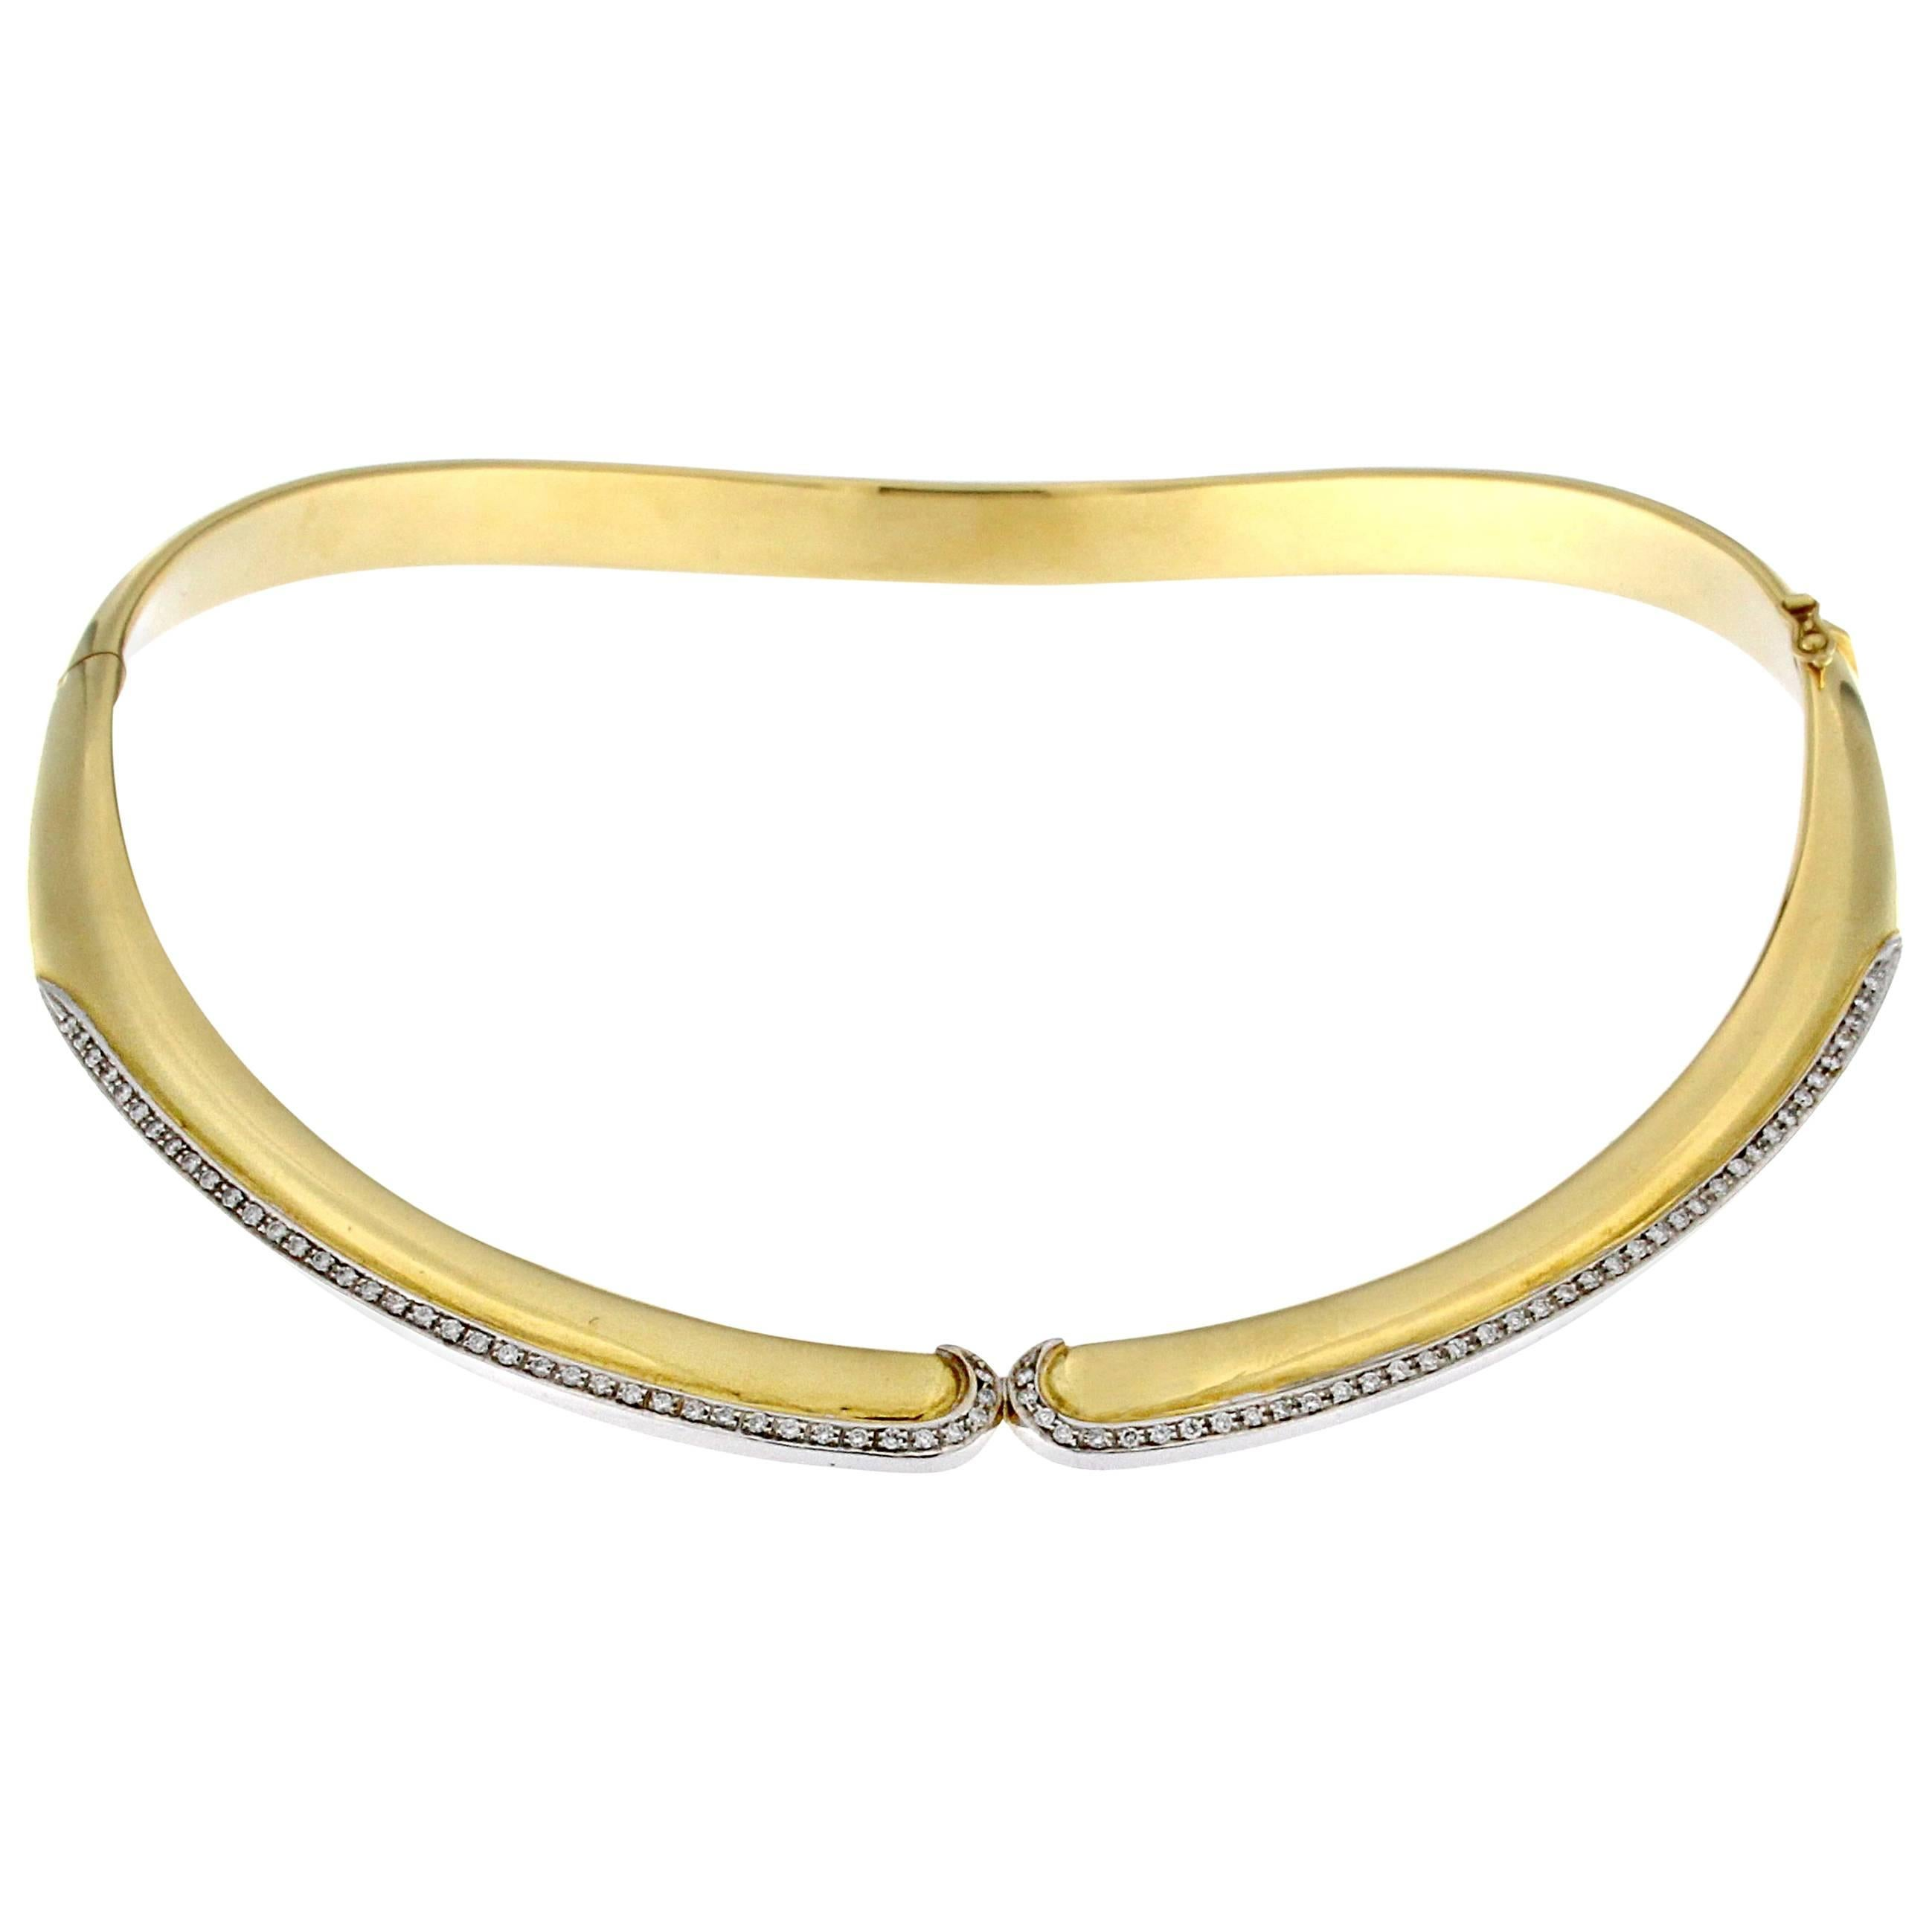 Rigid Collar in 18 Karat Yellow Gold and White Diamond Part over Yellow Gold